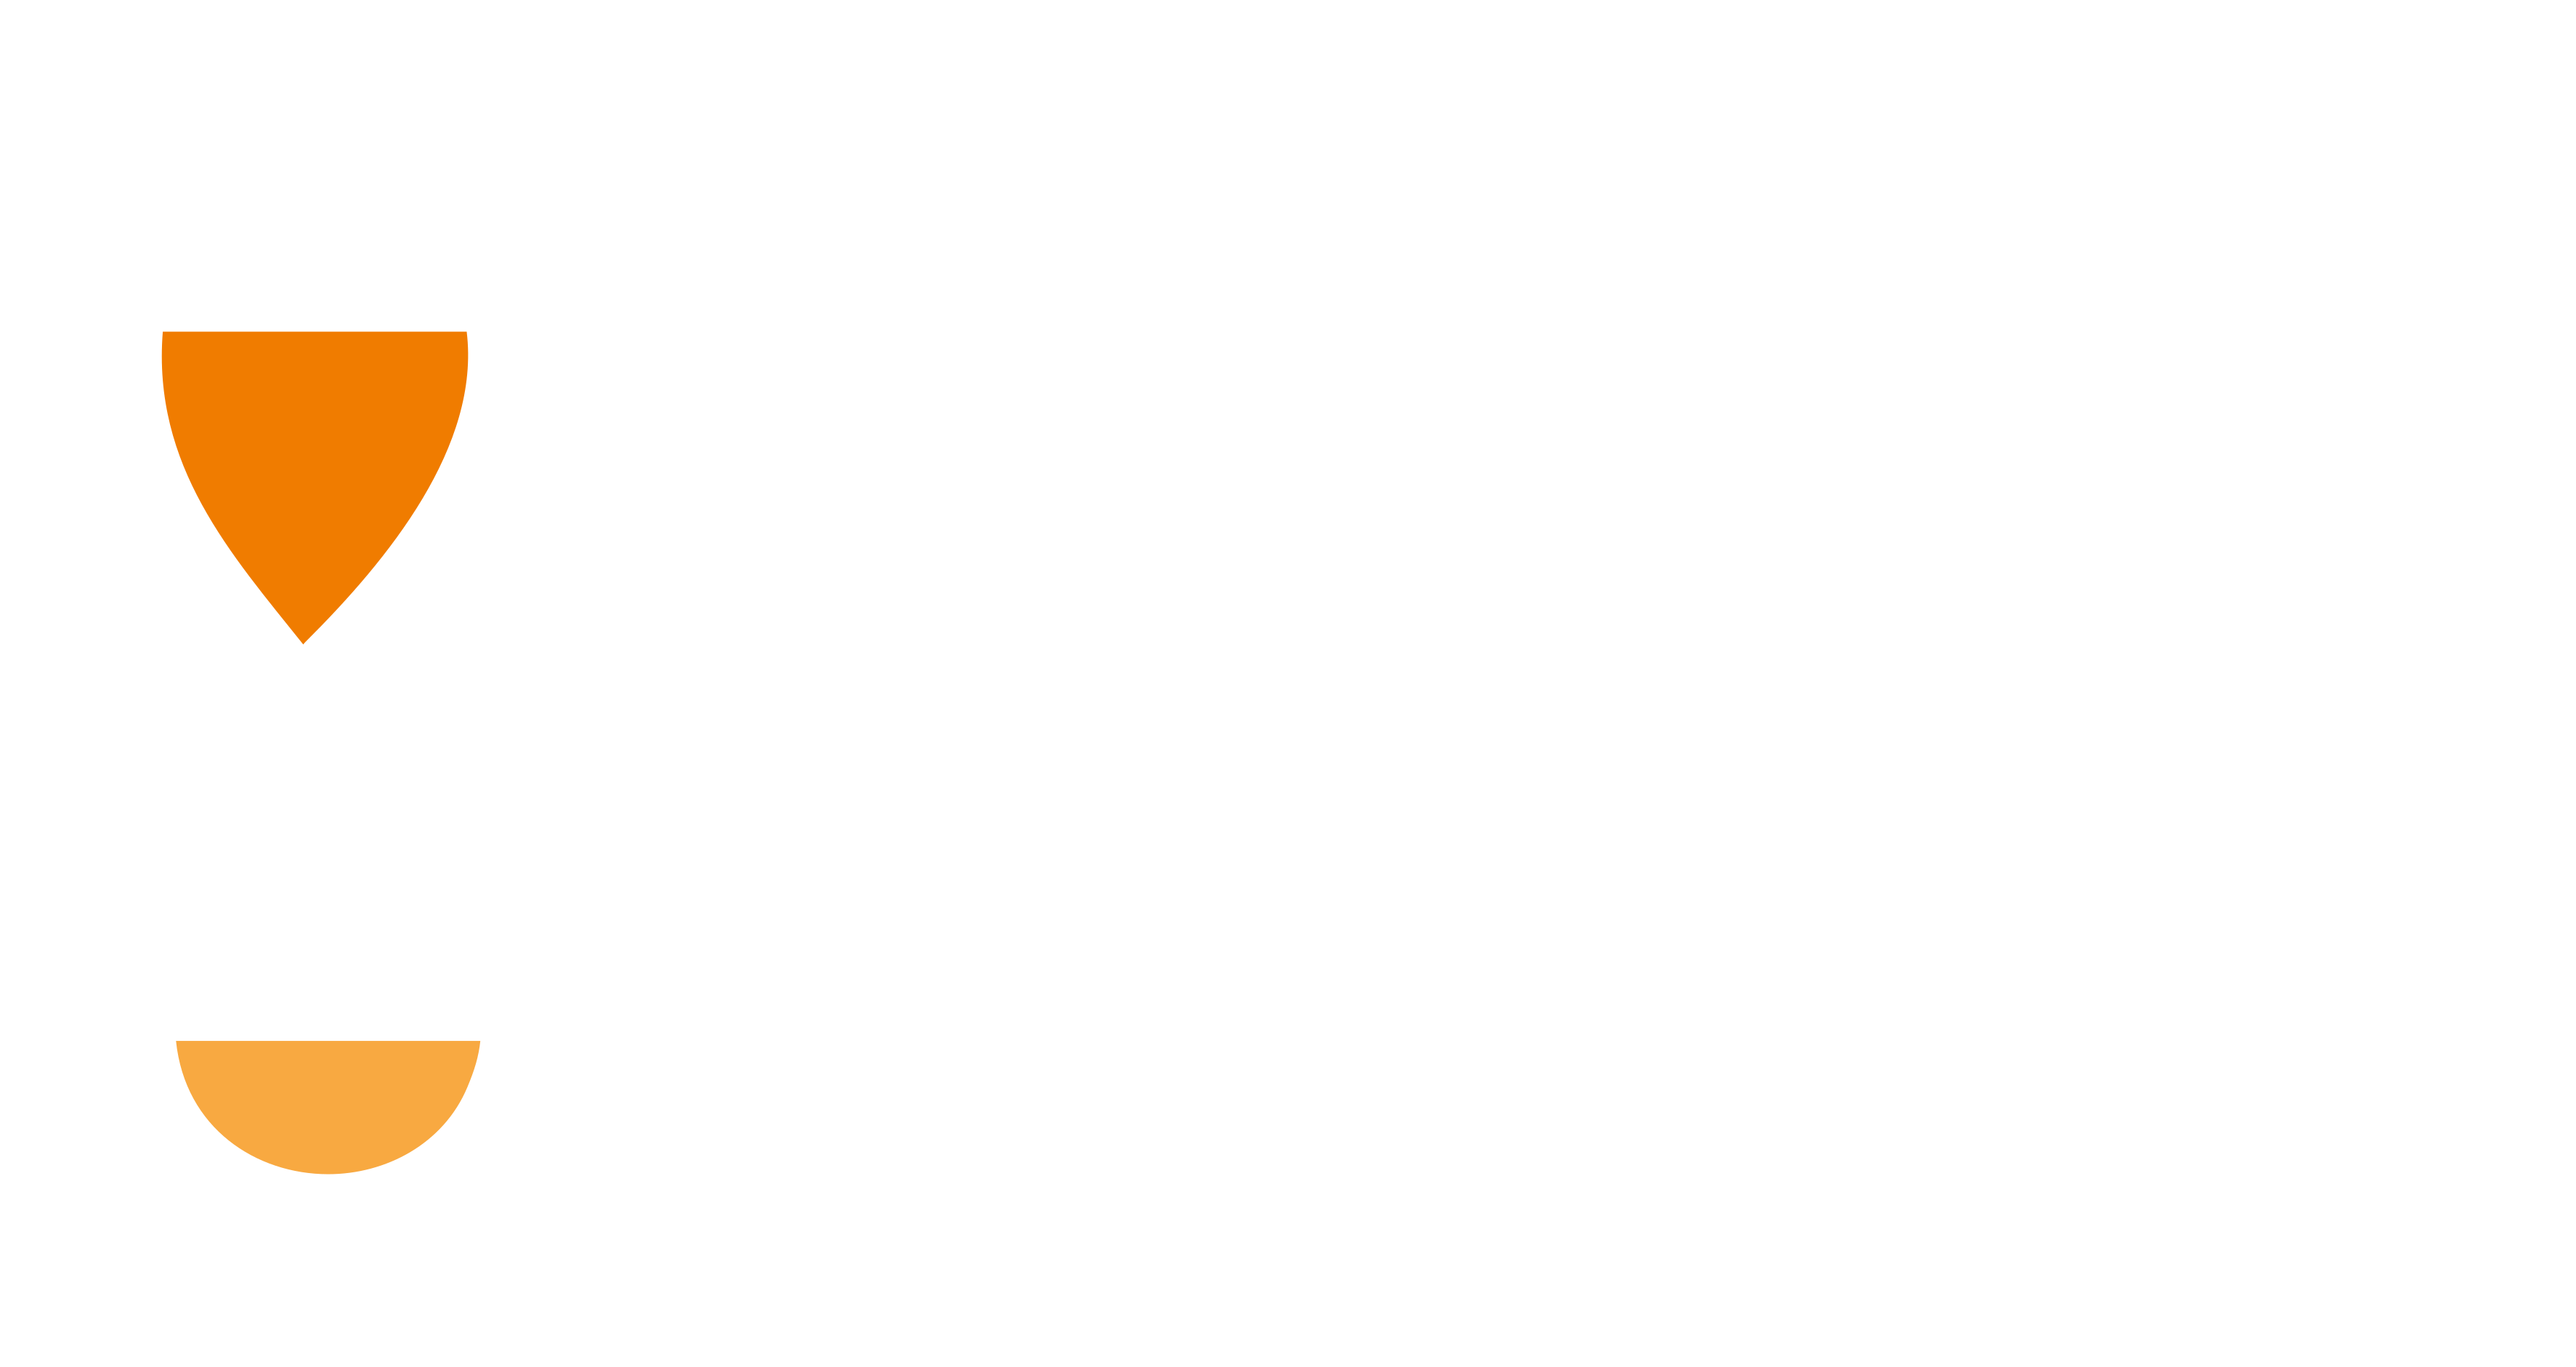 Revolução Prateada